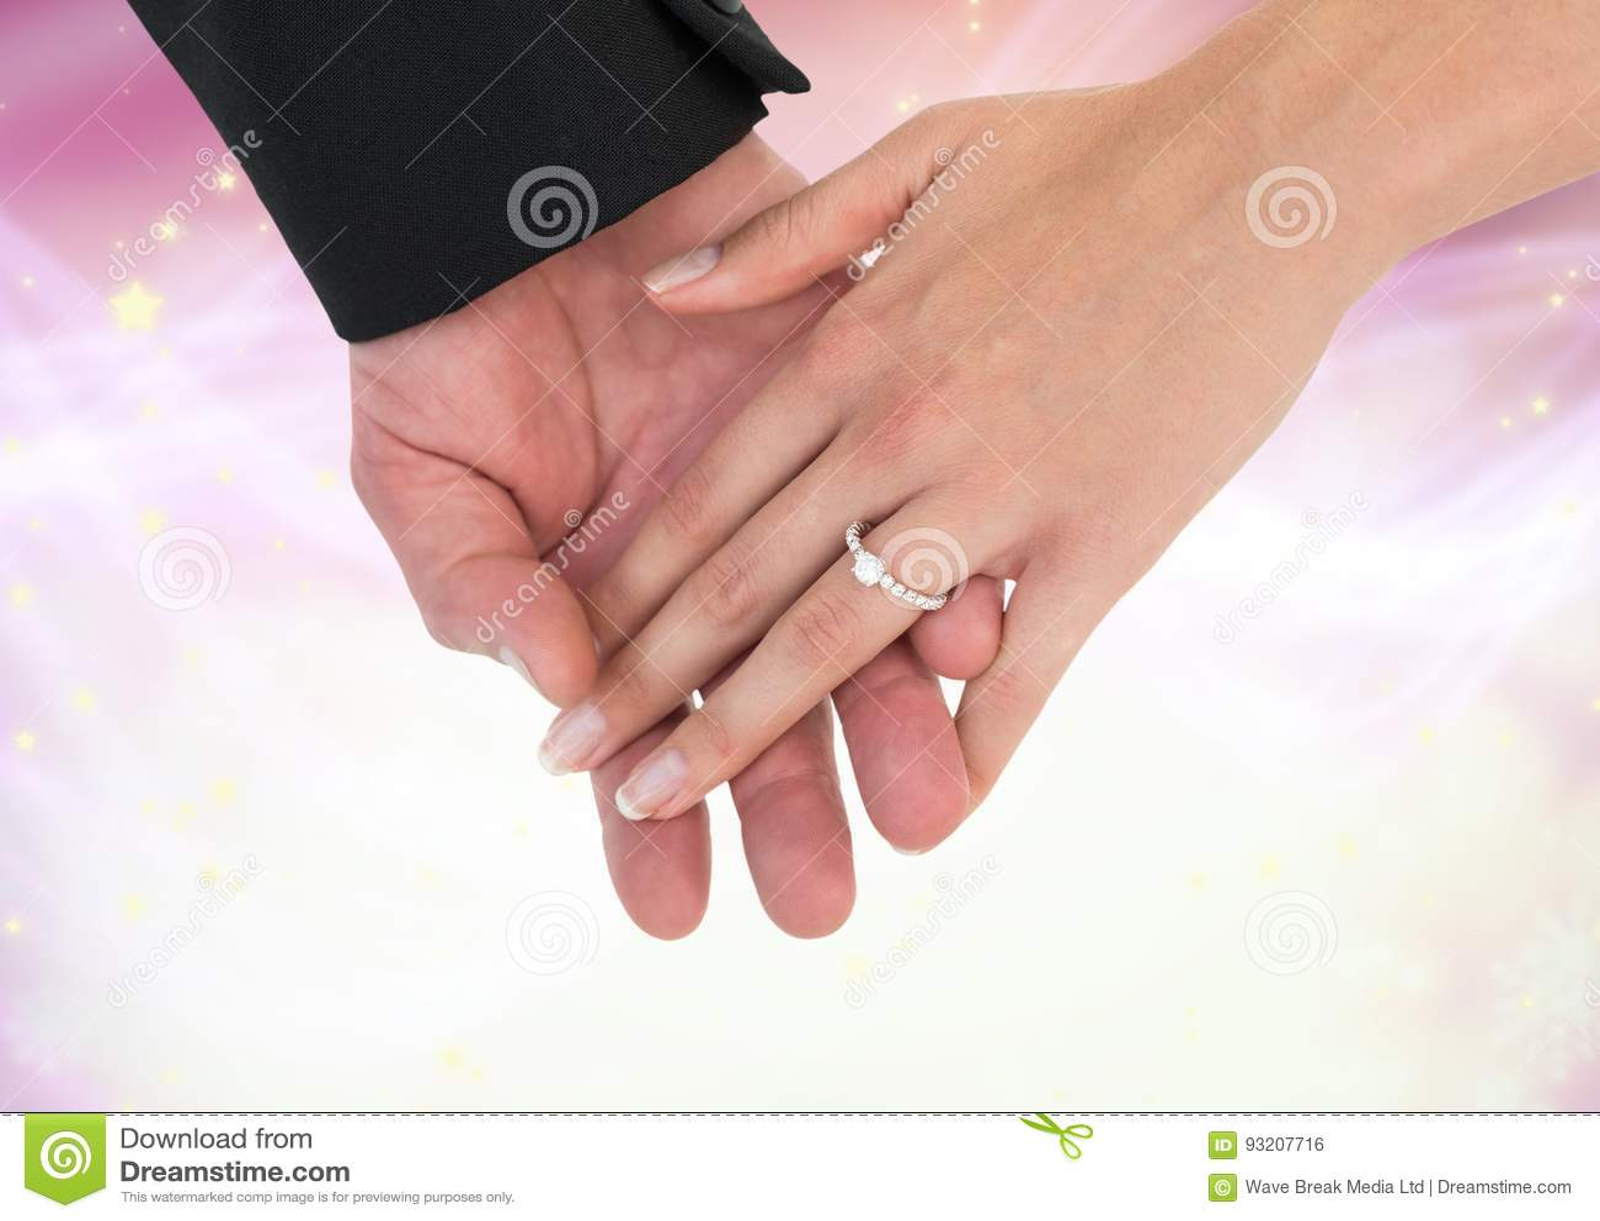 Hands Holding Together Wedding Engagement Ring With Sparkling Light ...